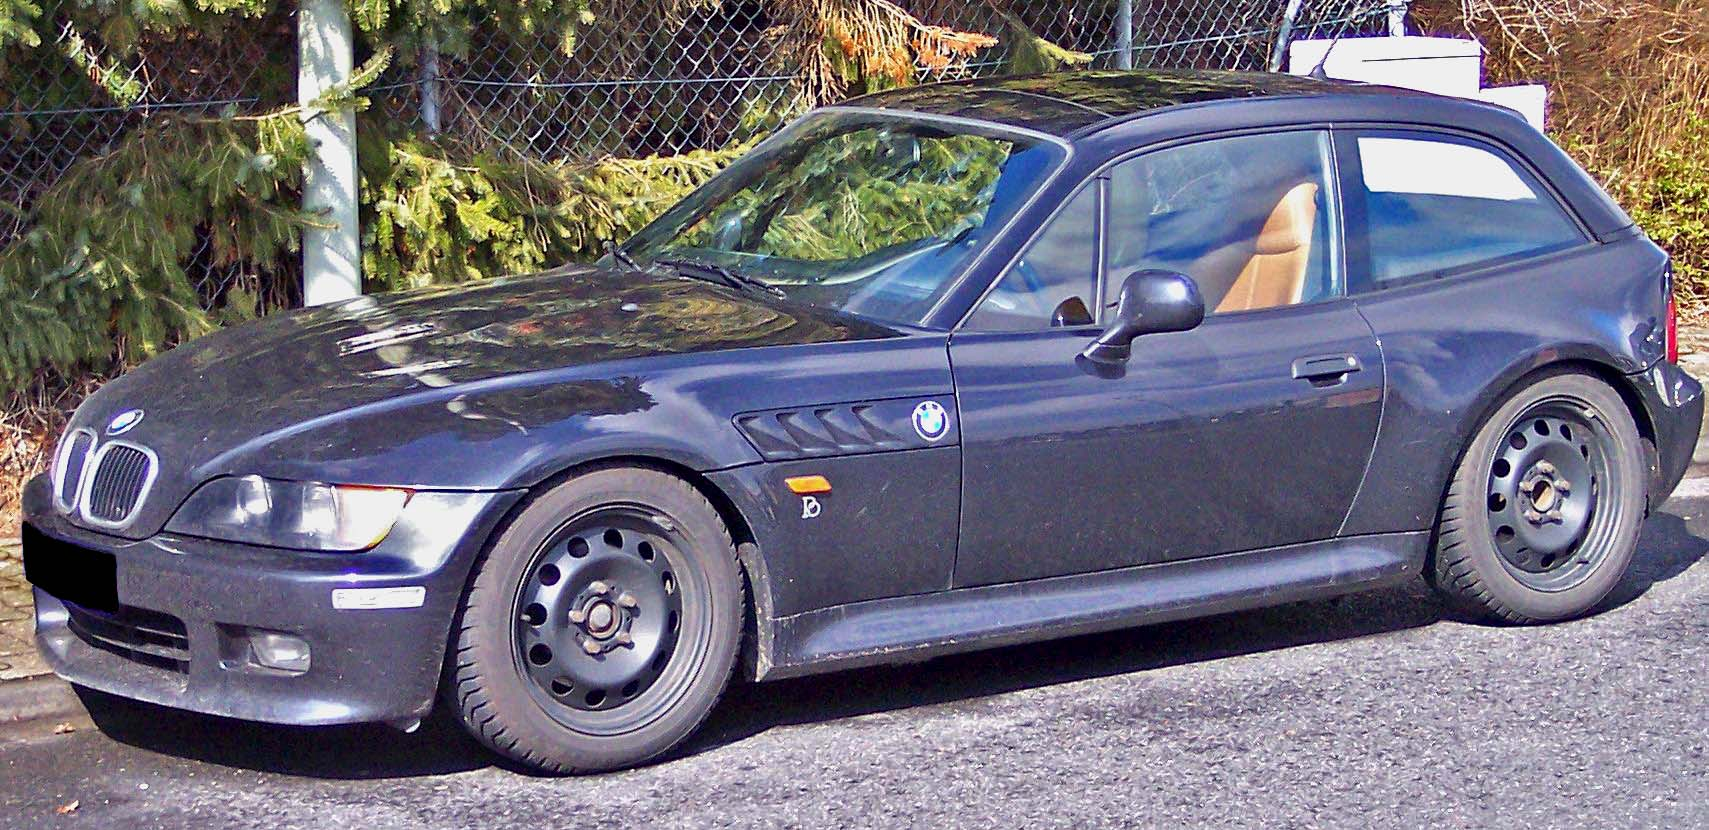 File Bmw Z3 Coupe Vl Blue Jpg Wikimedia Commons